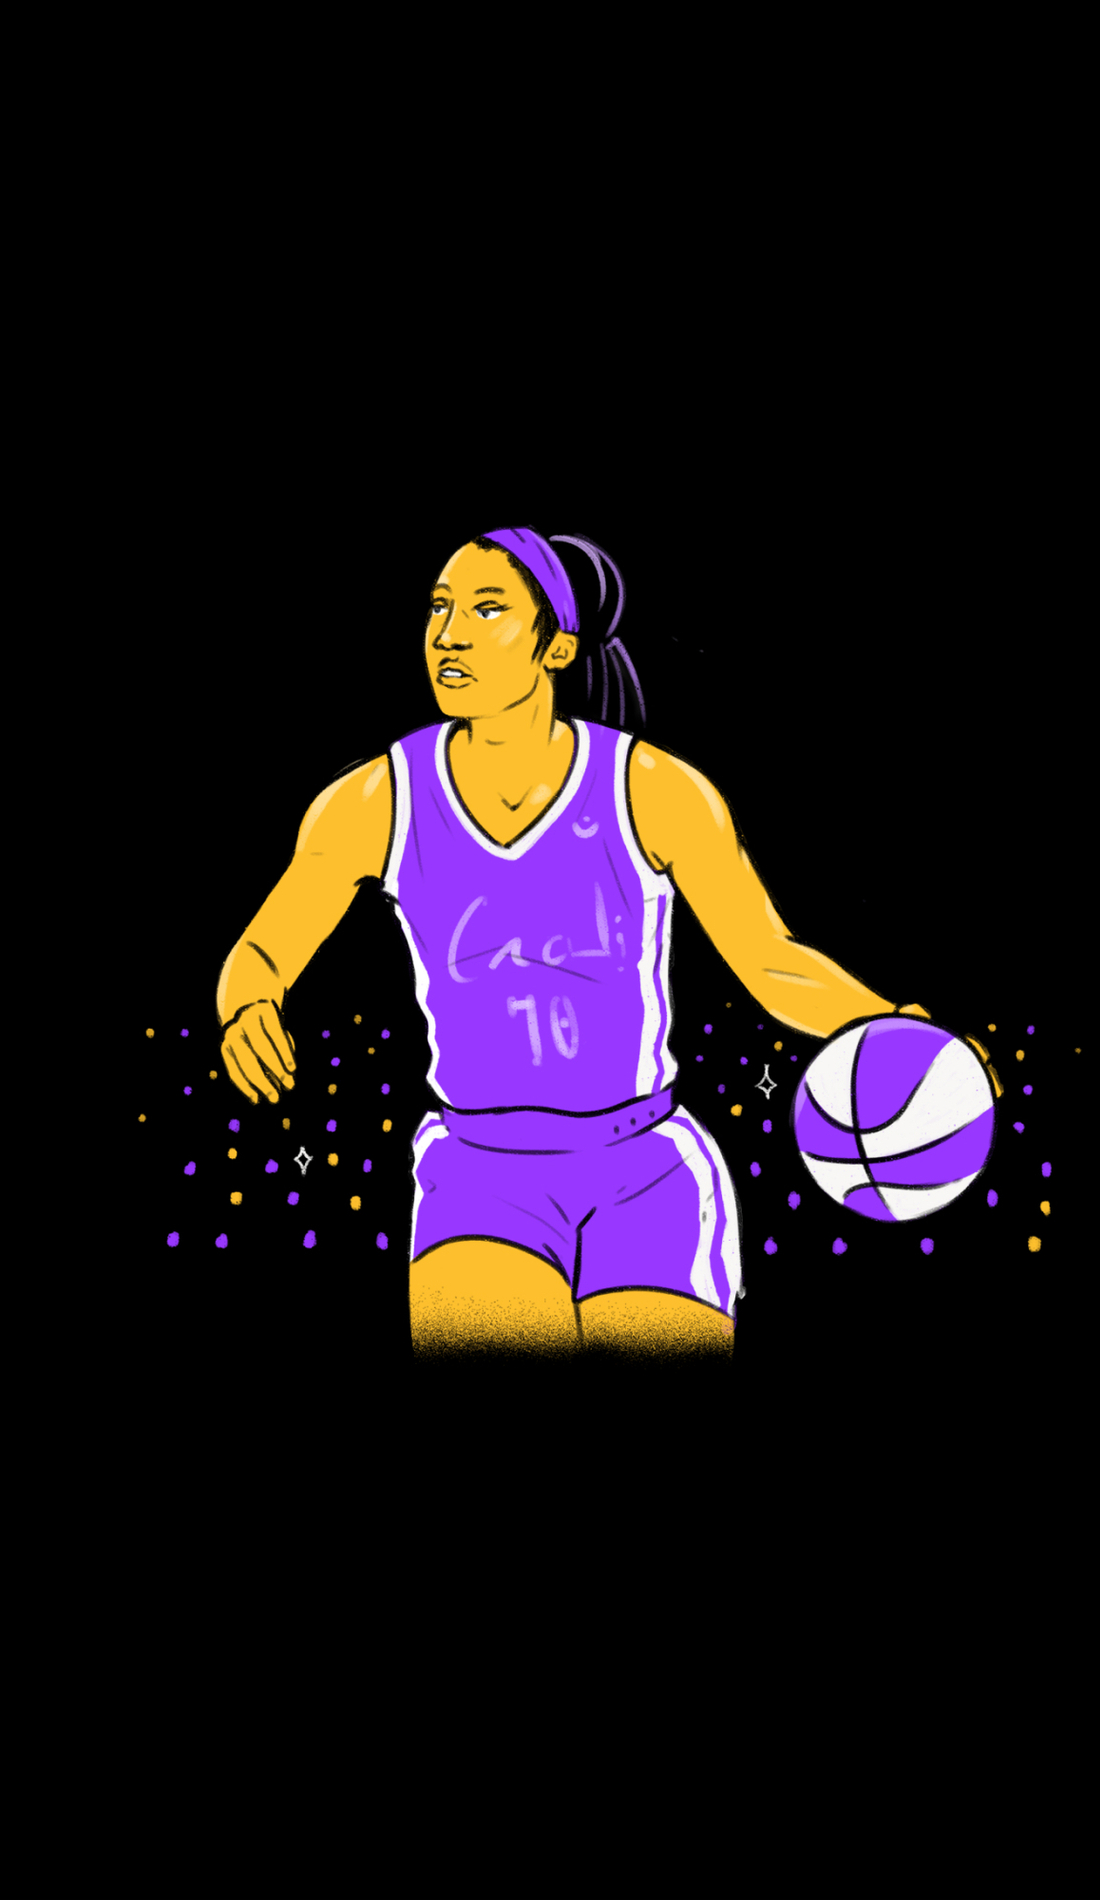 A North Carolina Tar Heels Womens Basketball live event